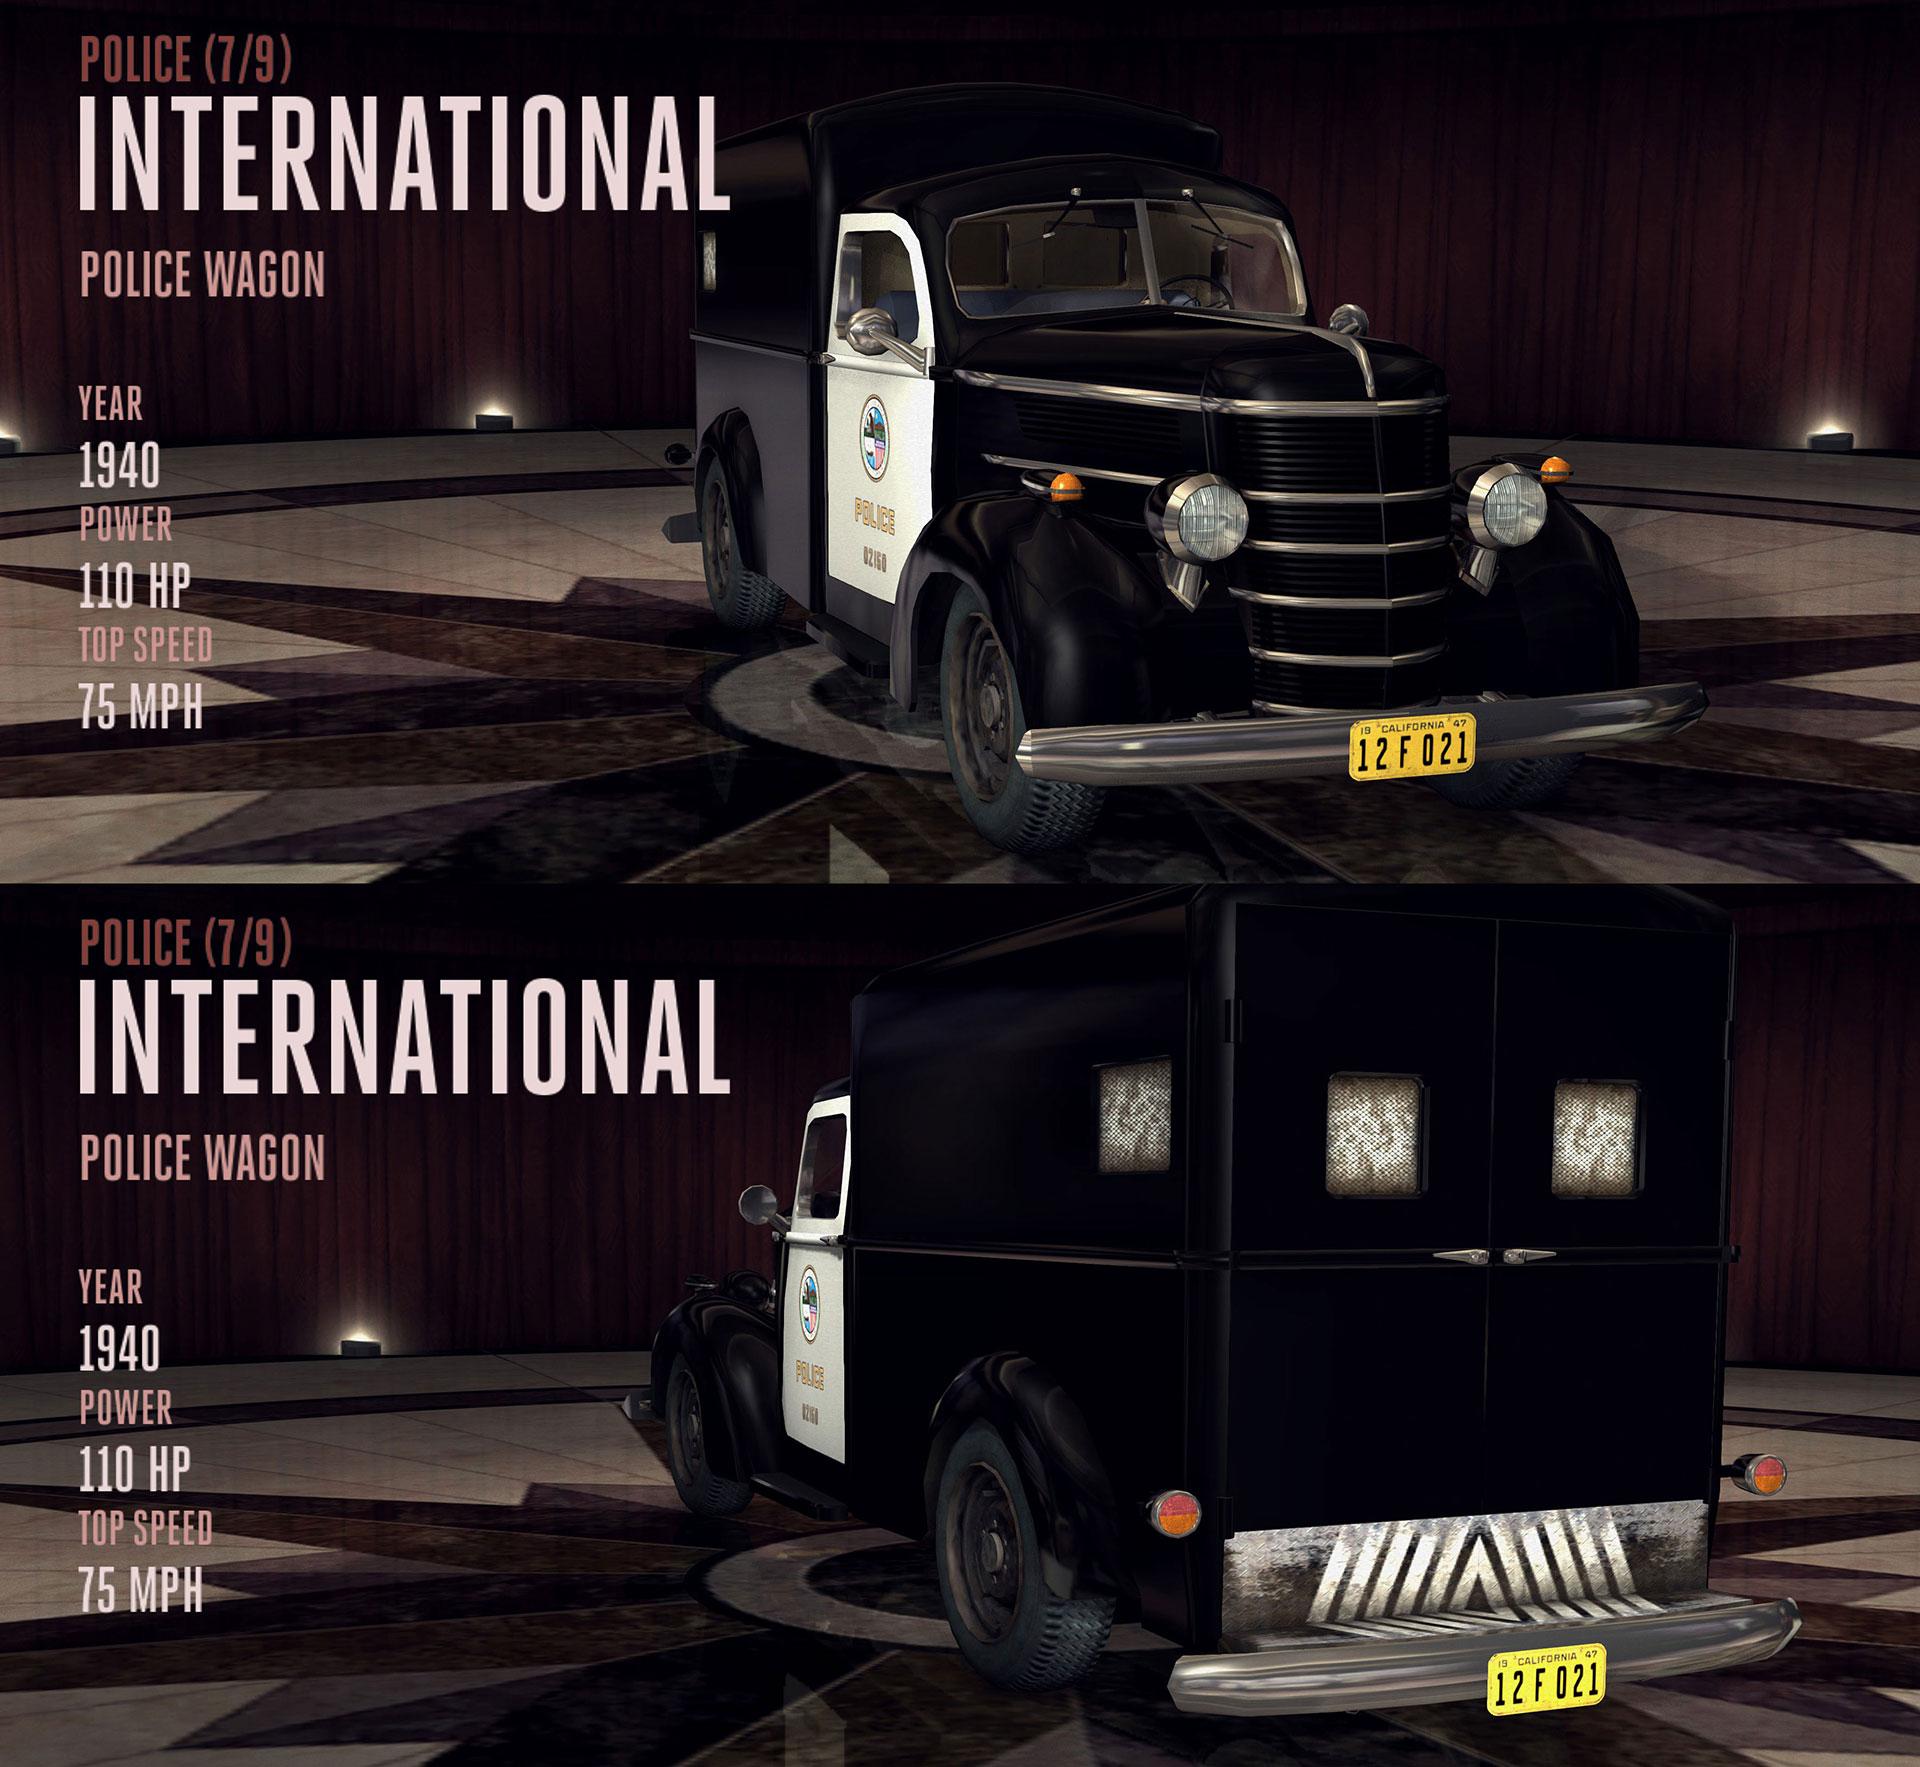 File:1940-international-police-wagon.jpg